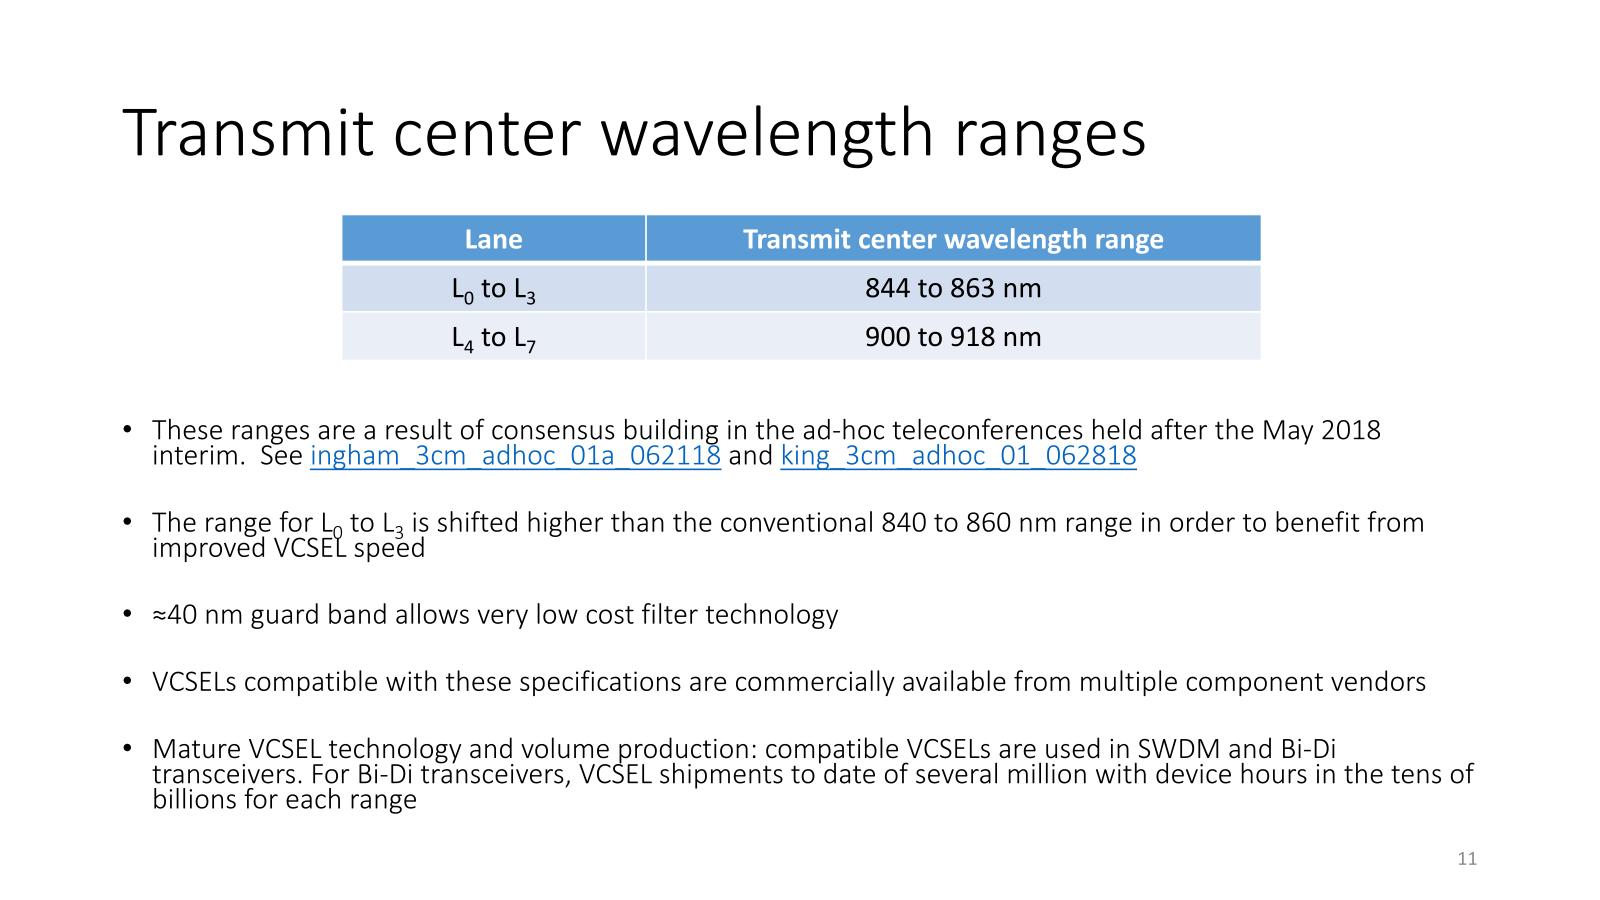 "L0~L3を一般的な840~860nmより若干長波長とすることで、VCSELを利用した場合の効率を上げているとするが、要するに合わせただけで、元々の400G-BD4.2が844~863nmを選んだ際の趣旨、という気もする。出典は""<a href=""https://www.ieee802.org/3/cm/public/July18/ingham_3cm_01b_0718.pdf"" class=""strong bn"" target=""_blank"">Baseline proposal for a 400 Gb/s optical PMD supporting four MMF pairs</a>"""